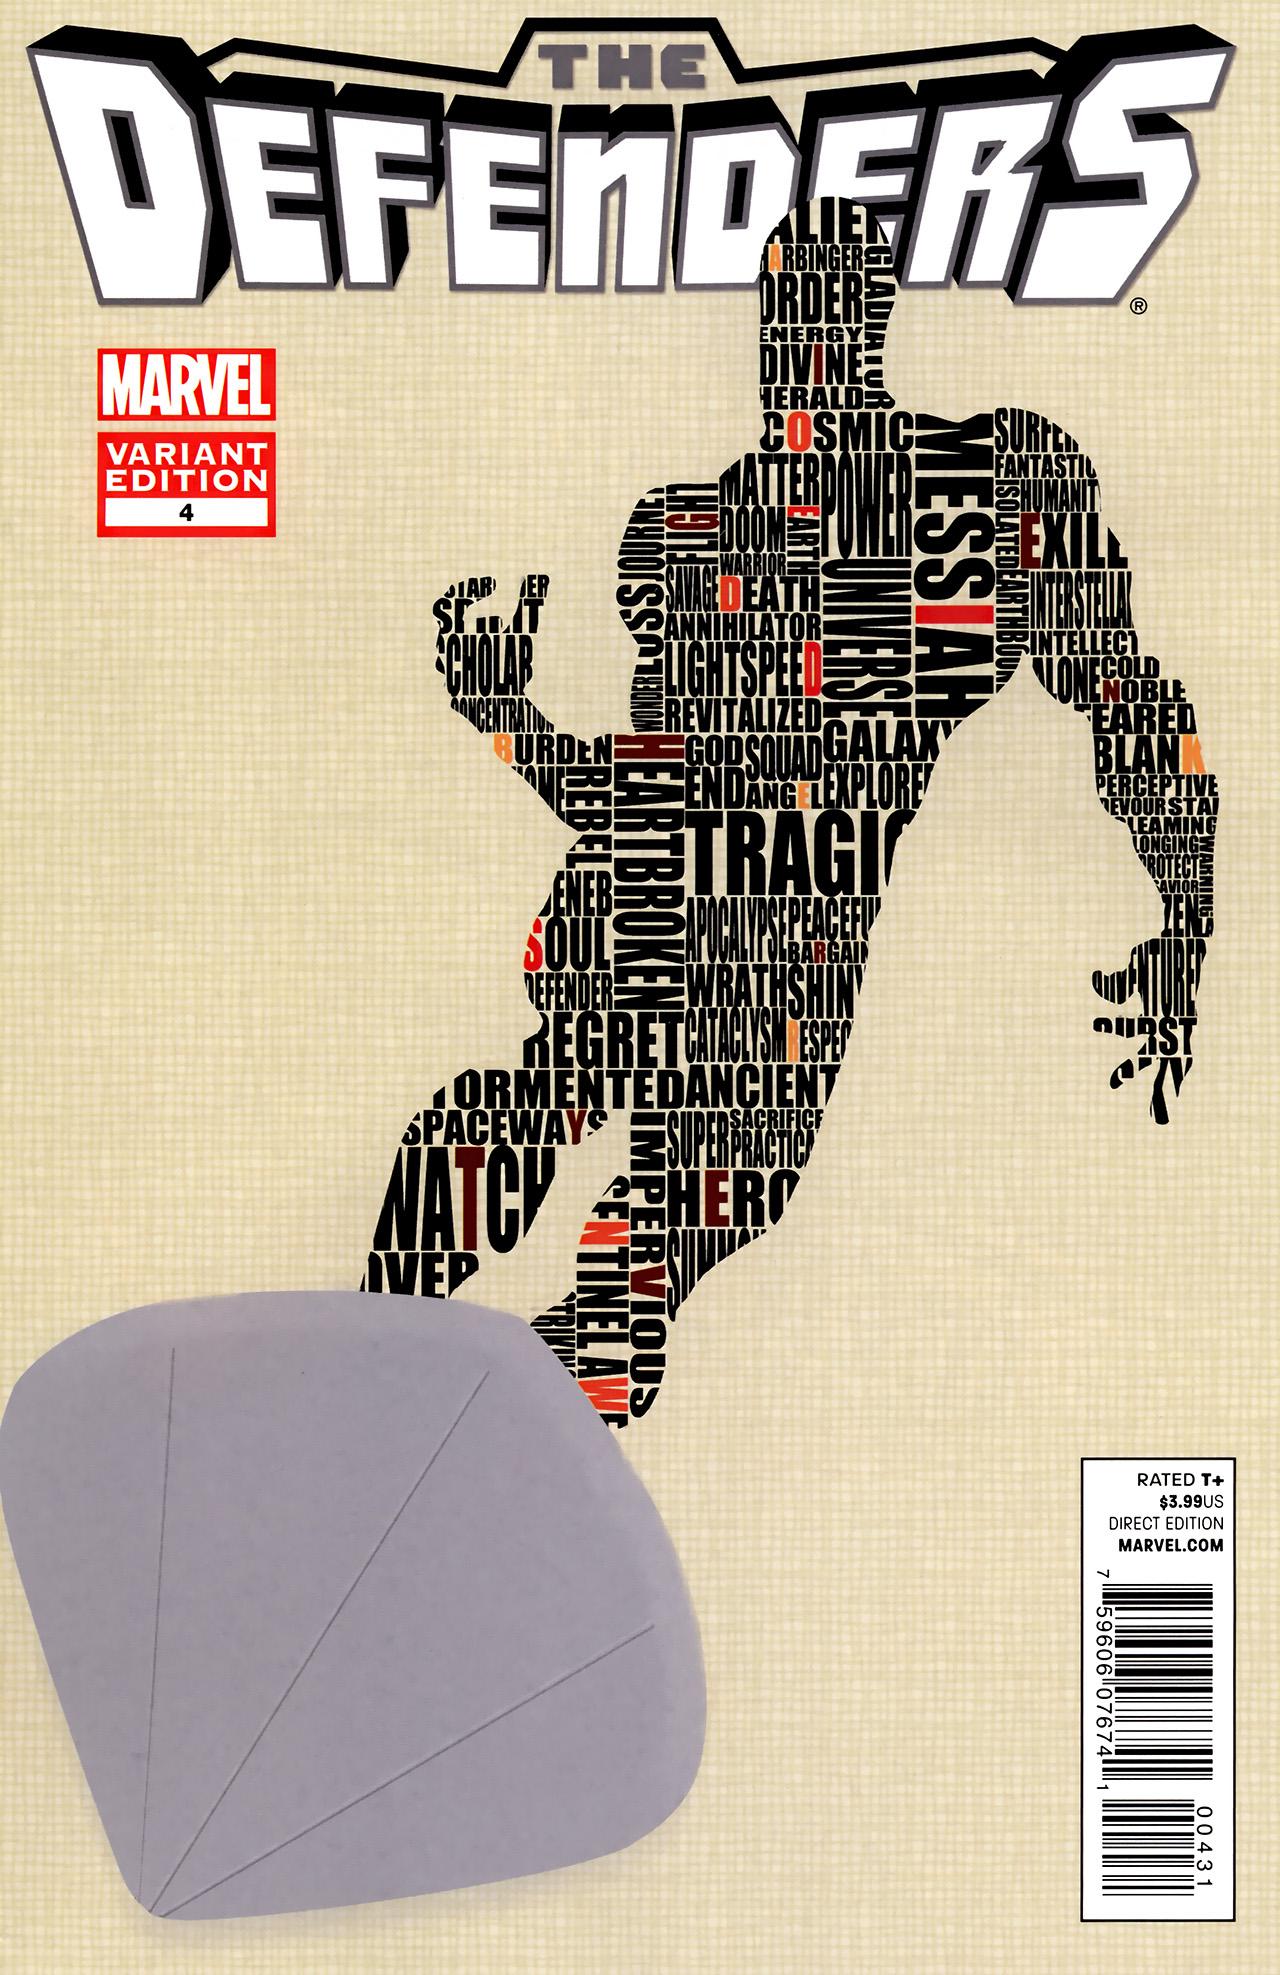 Defenders 2012 Issue 4 | Viewcomic reading comics online ...